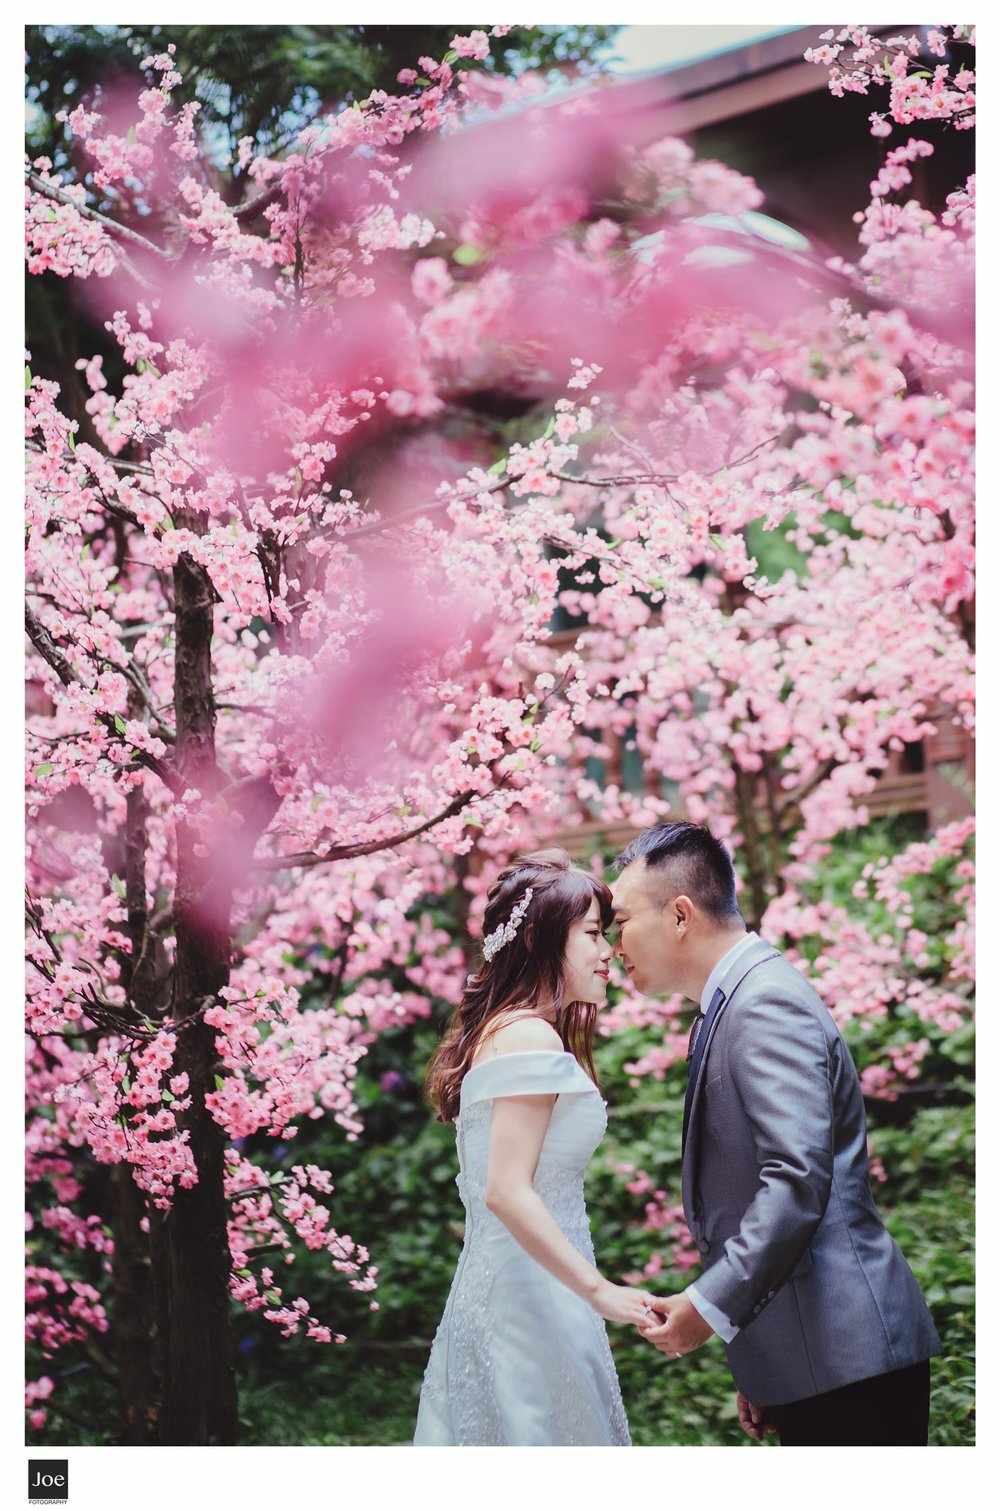 taiwan-pre-wedding-roger-wing-joe-fotography-012.jpg